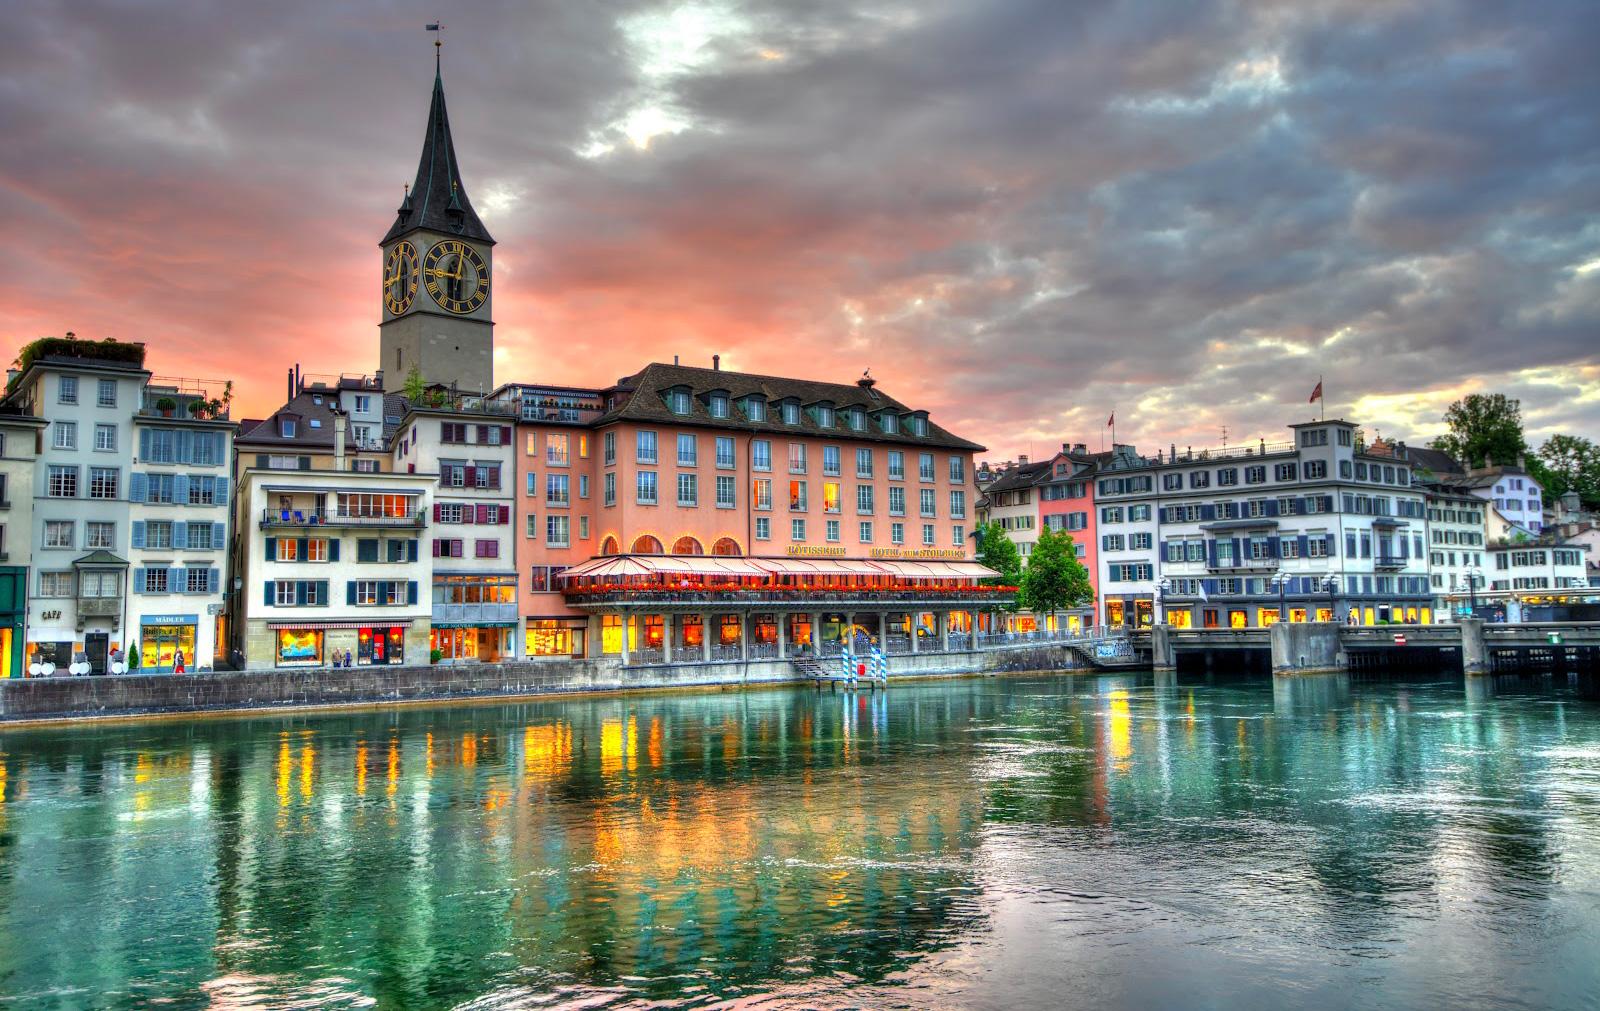 Suisse et Liechtenstein 4 jours